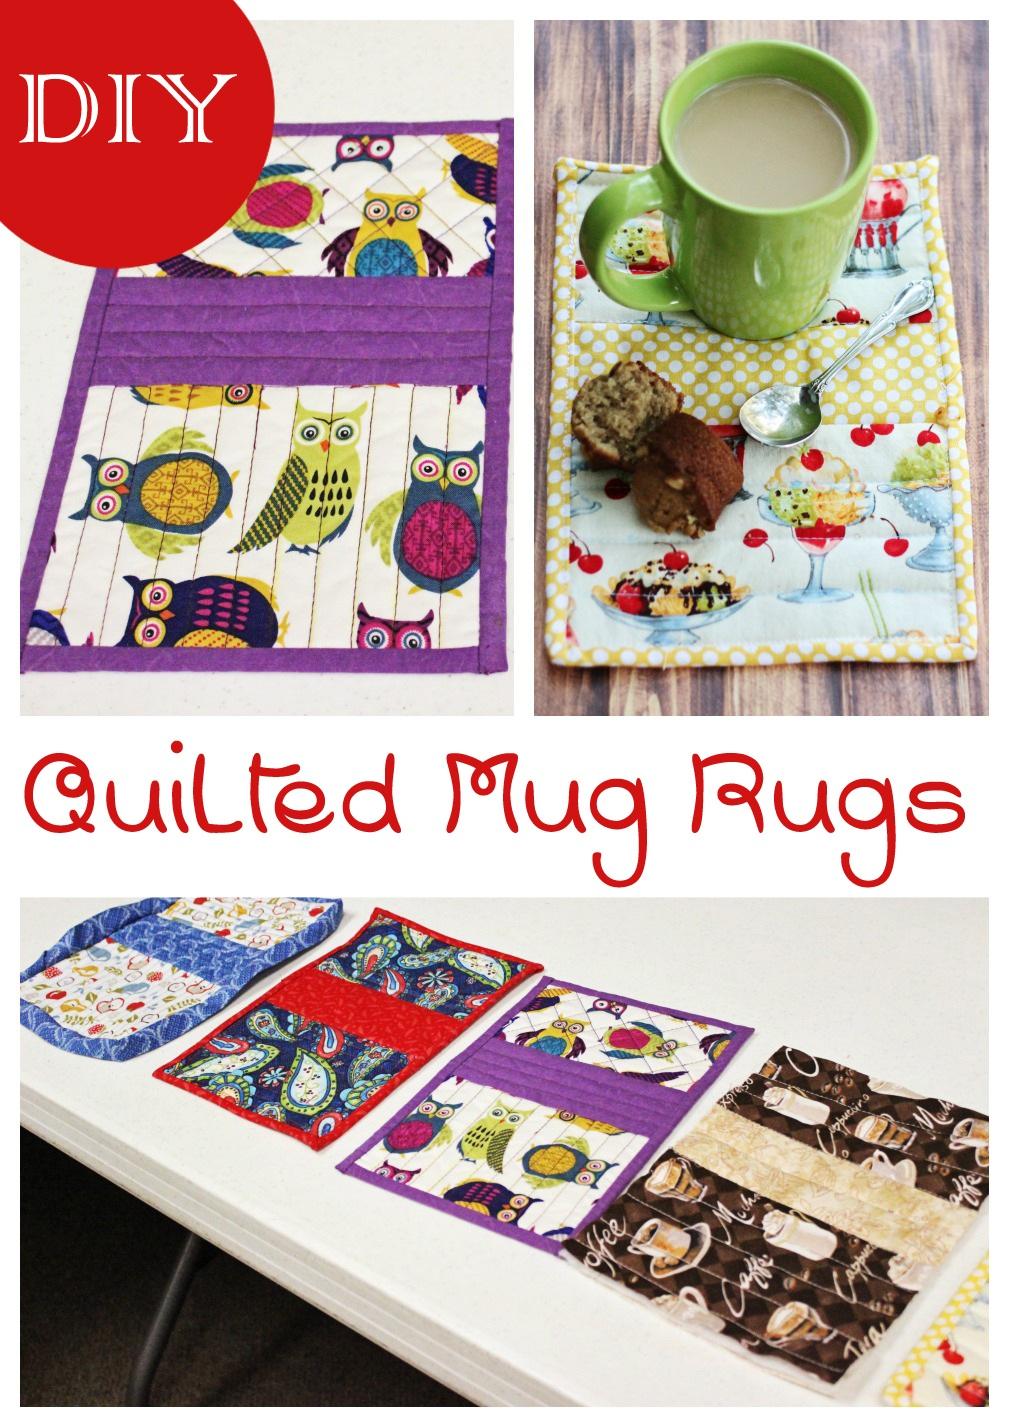 DIY Quilted Mug Rugs